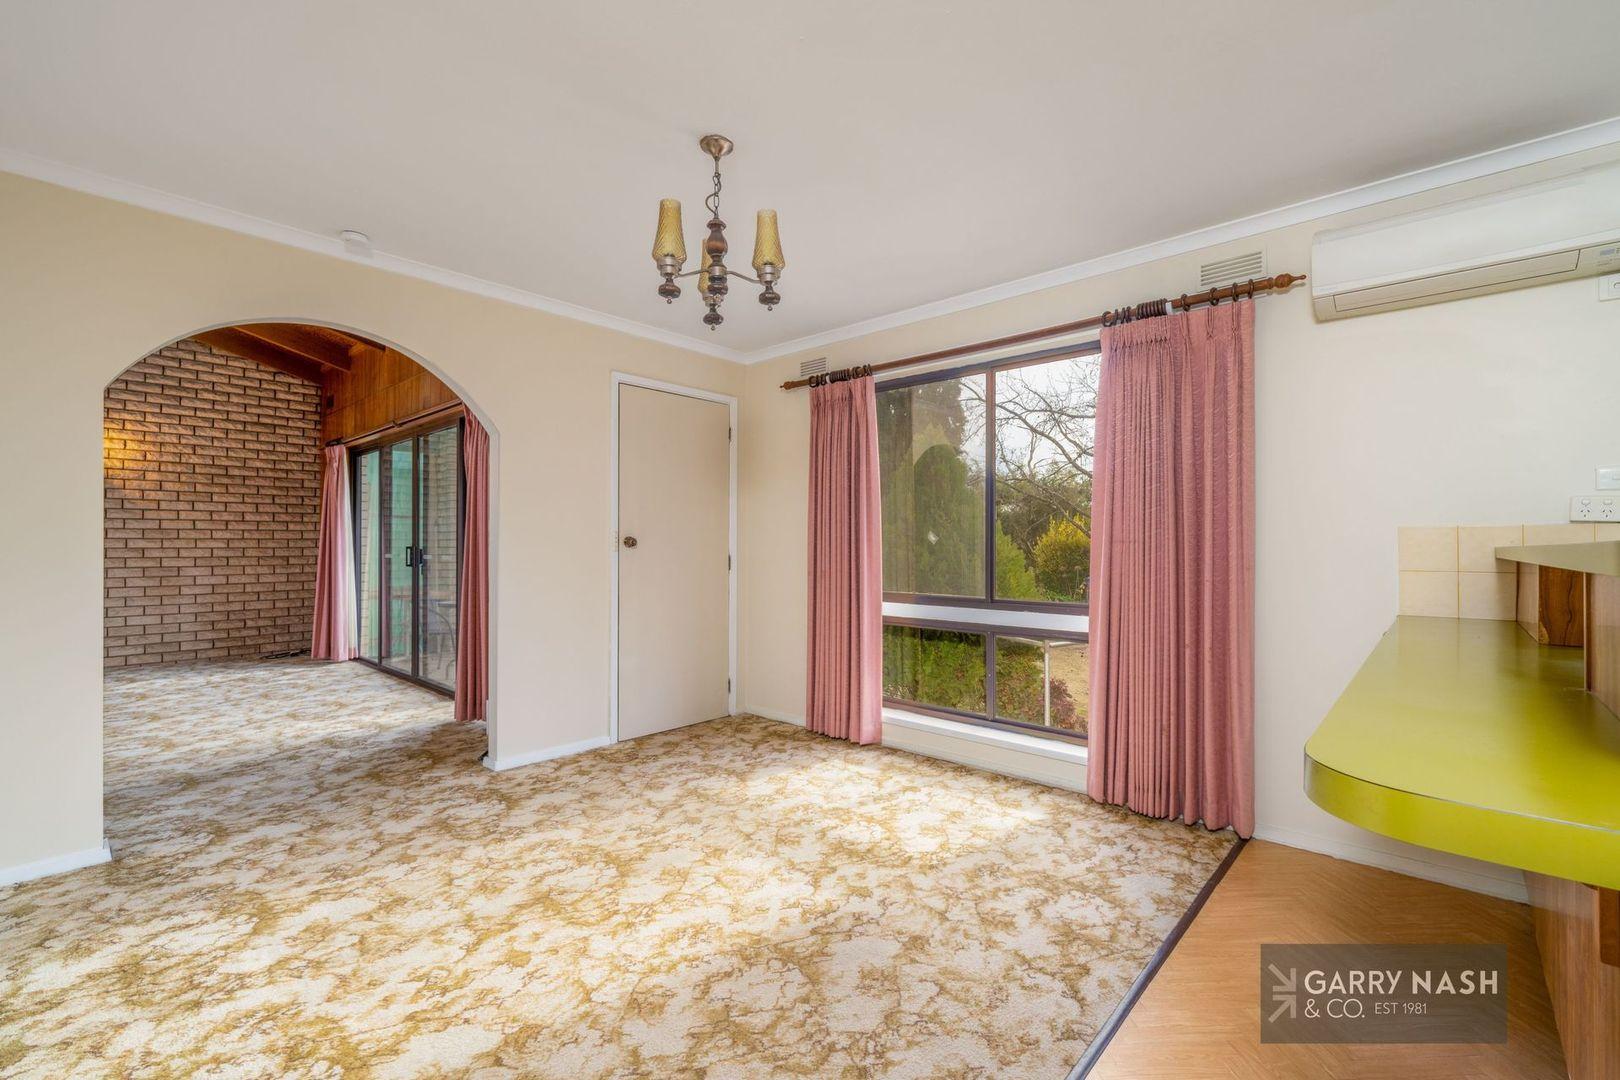 2299 Beechworth - Wangaratta Road, Tarrawingee VIC 3678, Image 2